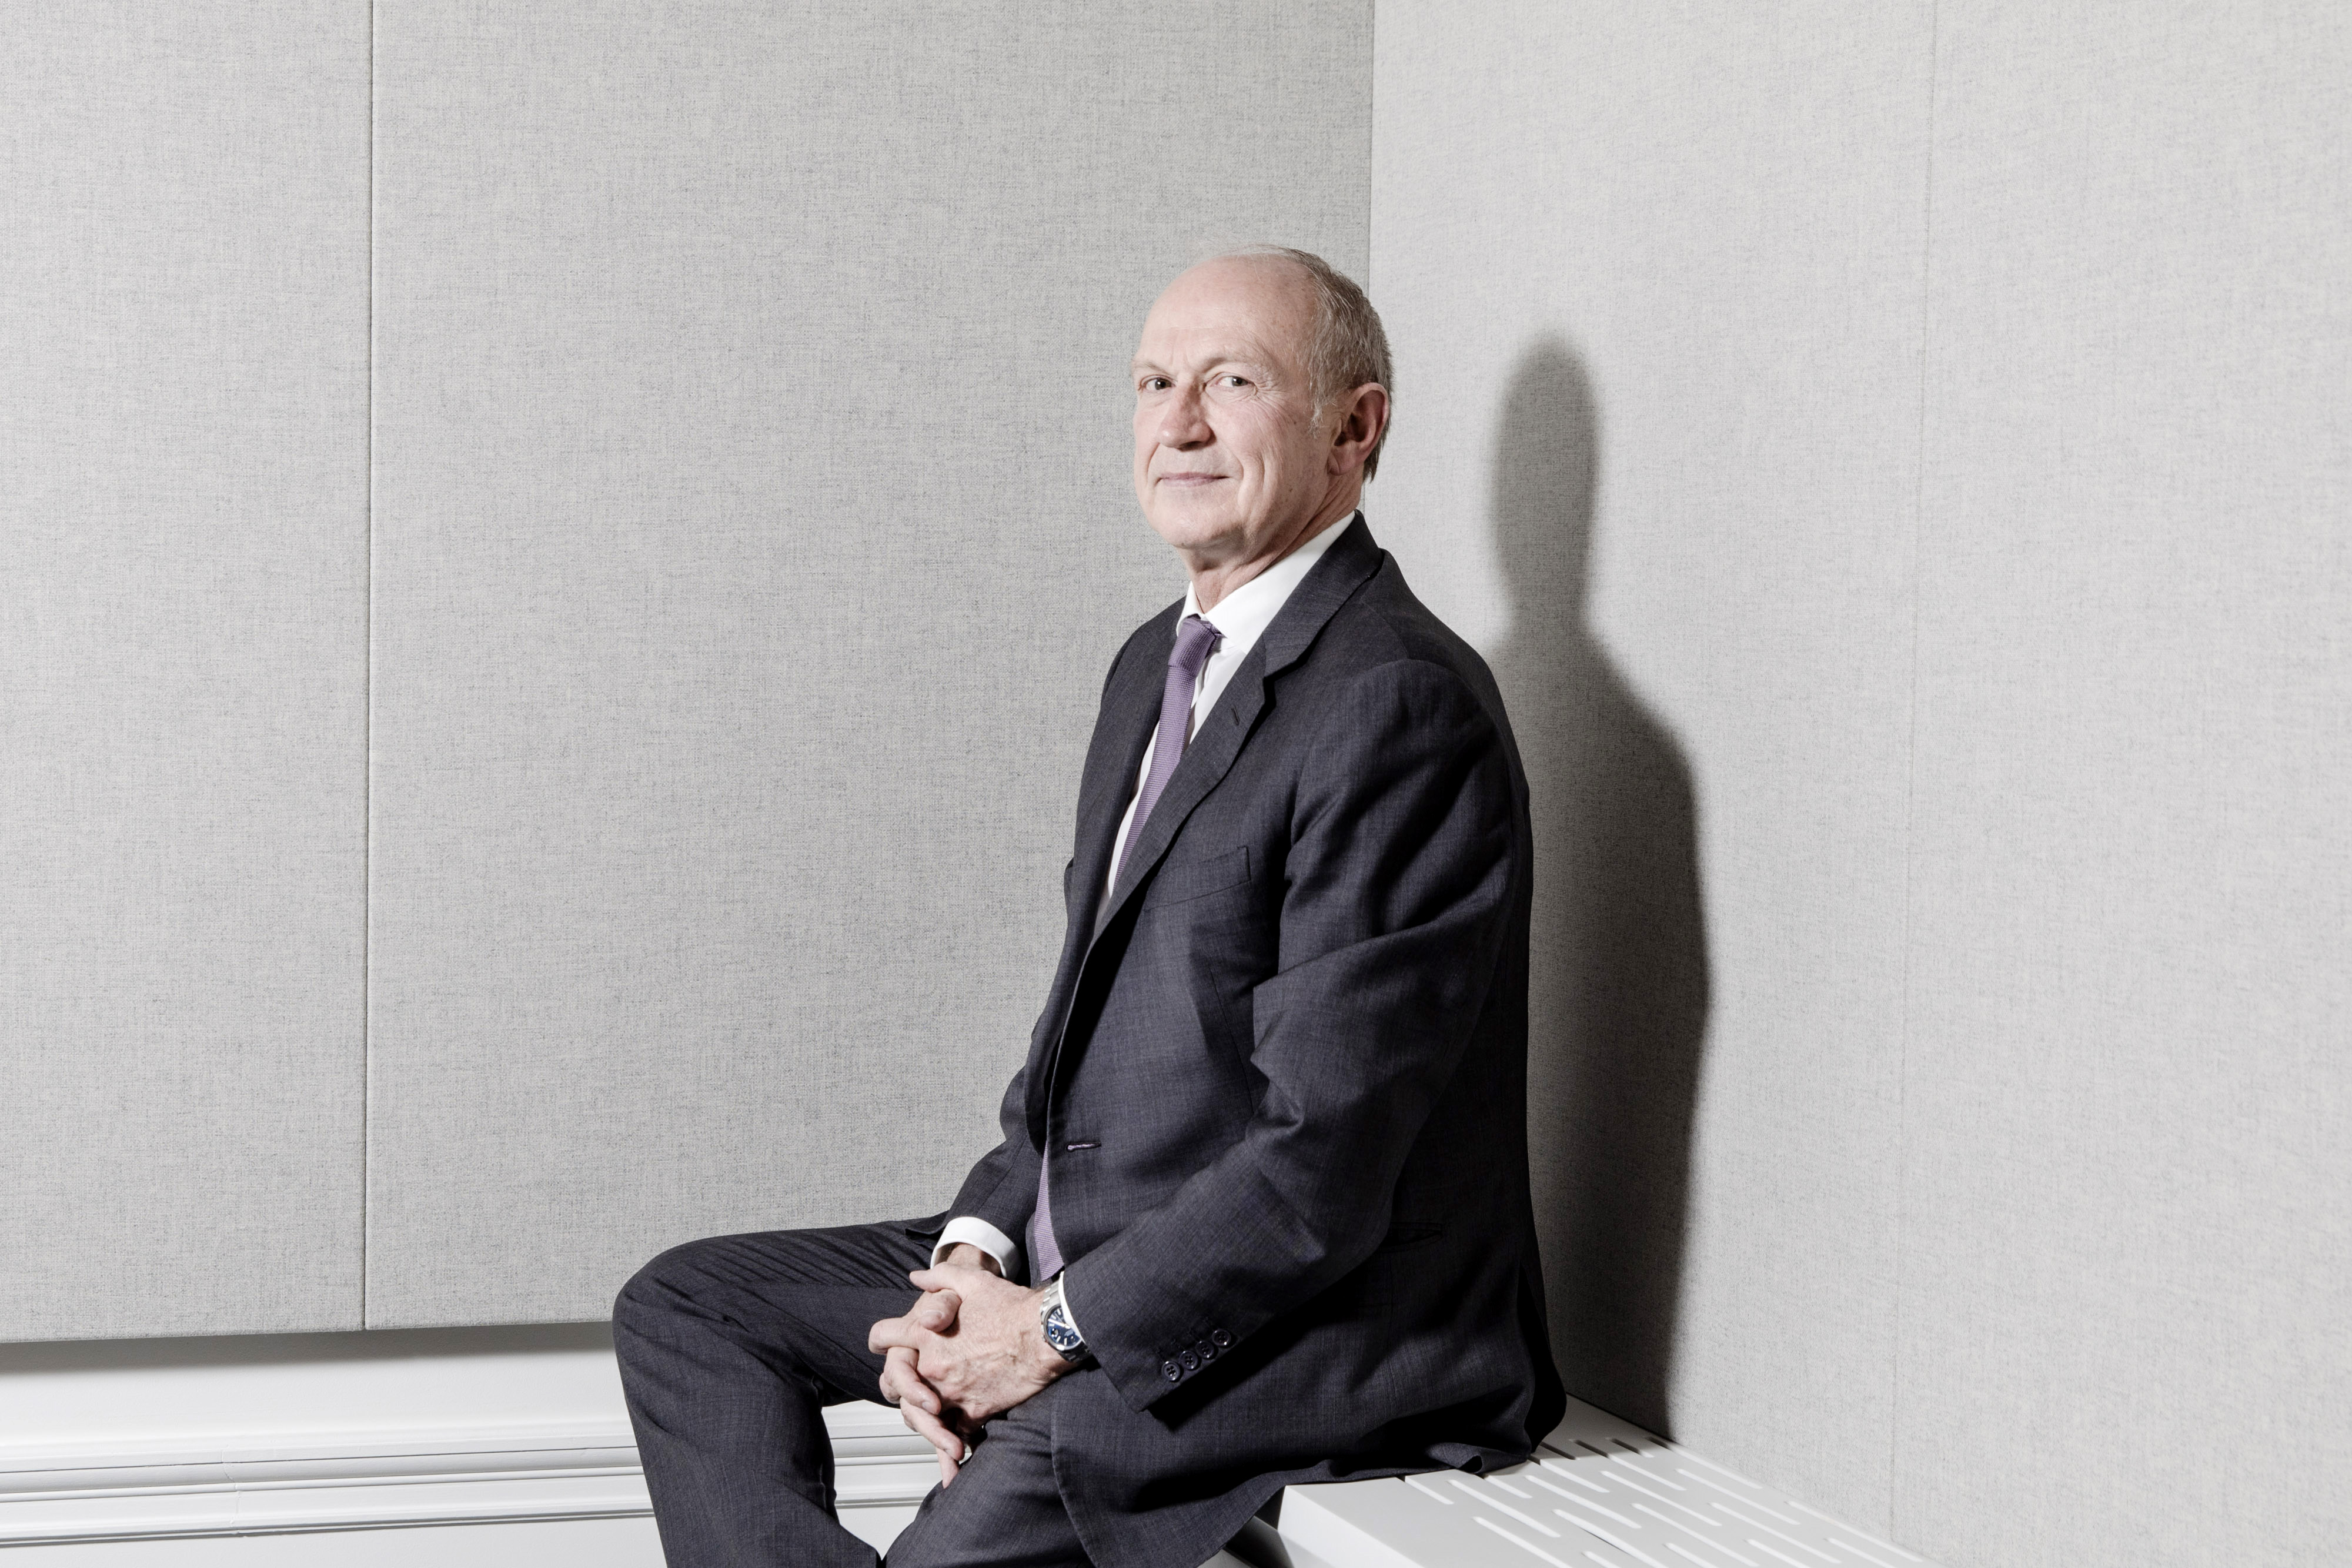 L'Oreal SA Chief Executive Officer Jean-Paul Agon Portraits